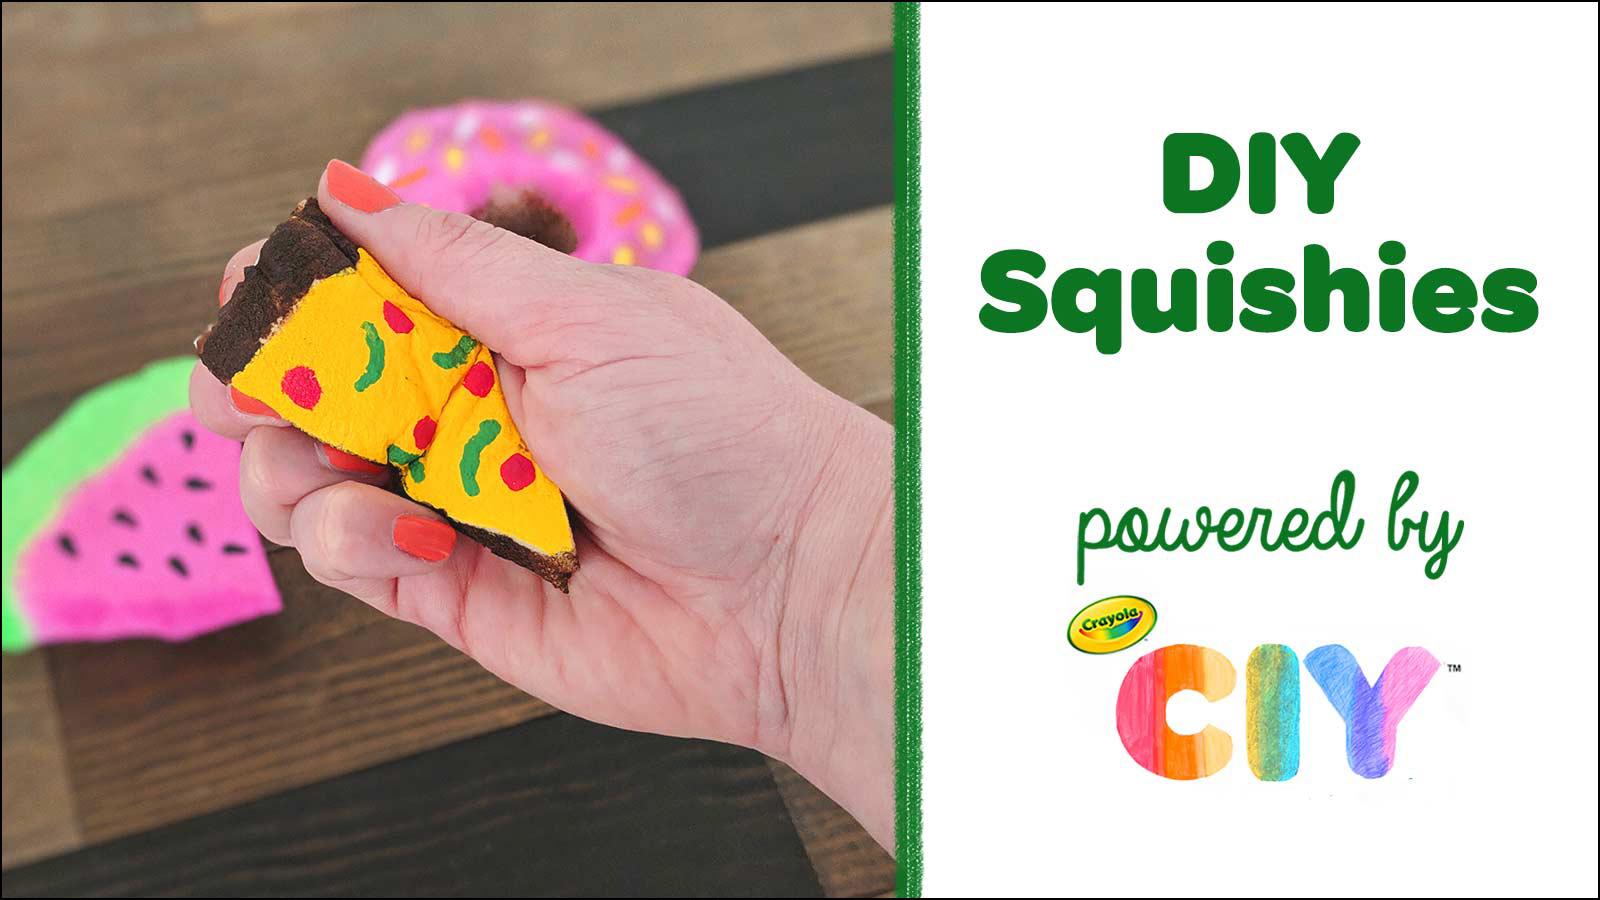 Diy Squishies Squishy Toy Kids Craft Crafts Crayola Com Crayola Ciy Diy Crafts For Kids And Adults Crayola Com